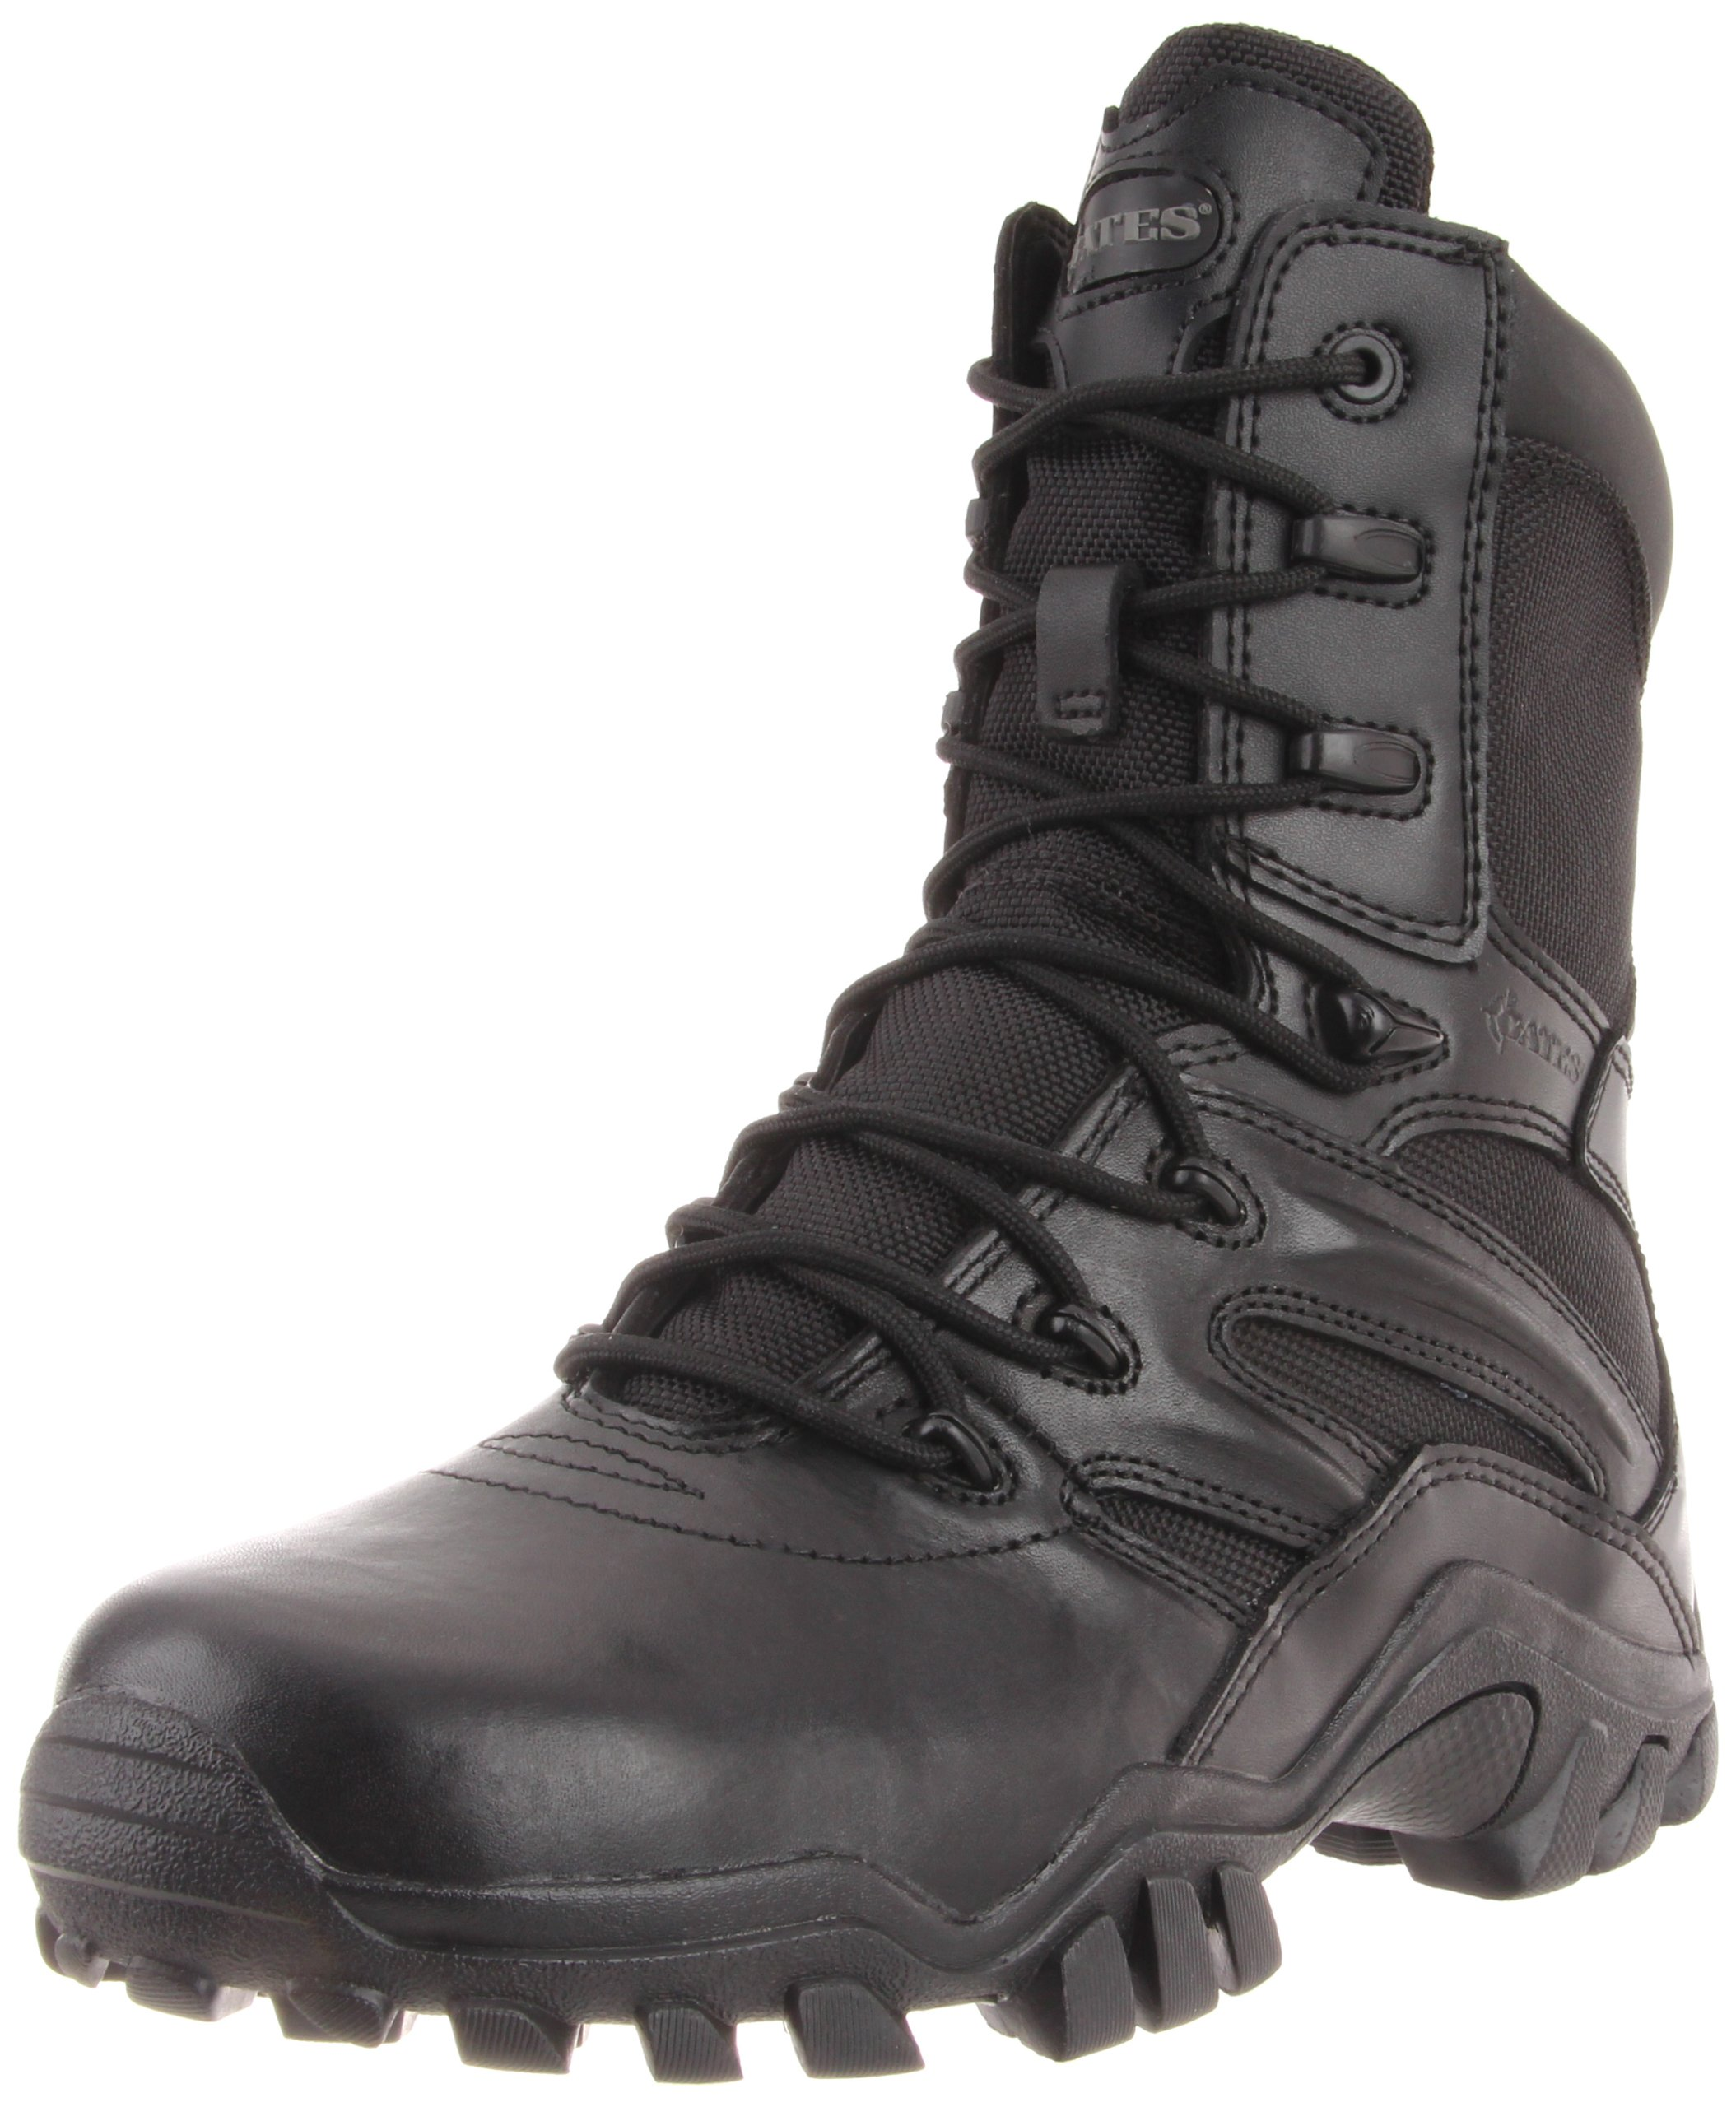 Bates Women's Delta 8 Inch Boot, Black, 7.5 M US by Bates